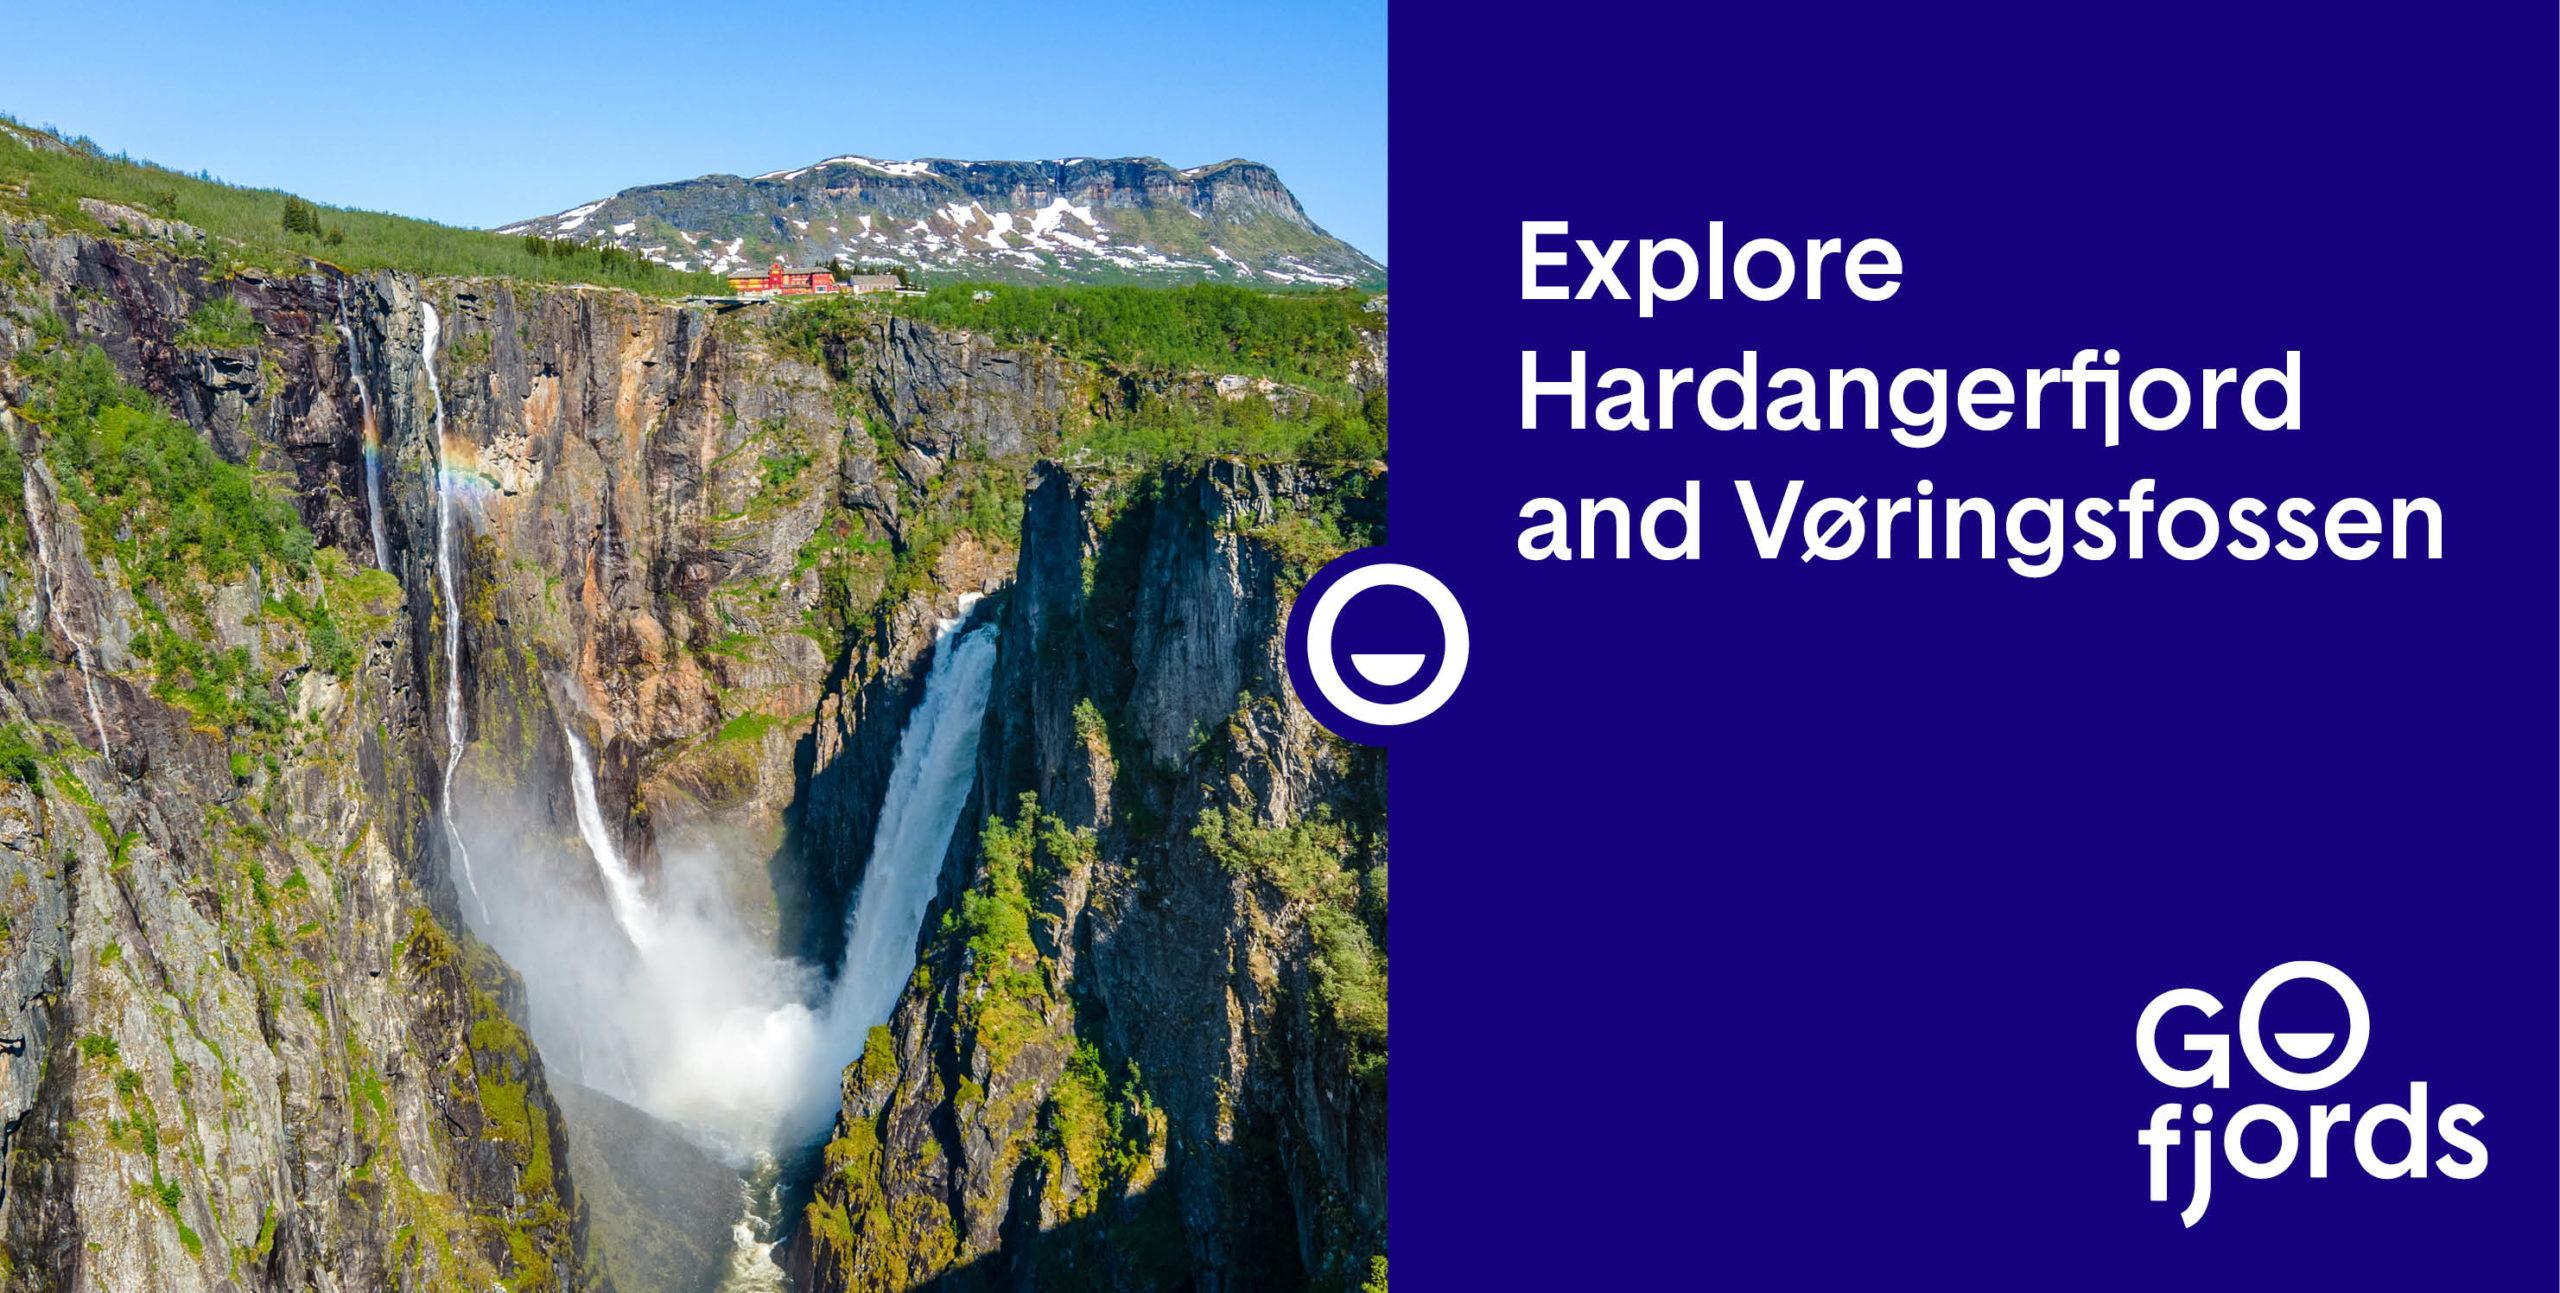 GoFjords.com - Explore the Hardangerfjord and Vøringsfossen Waterfall